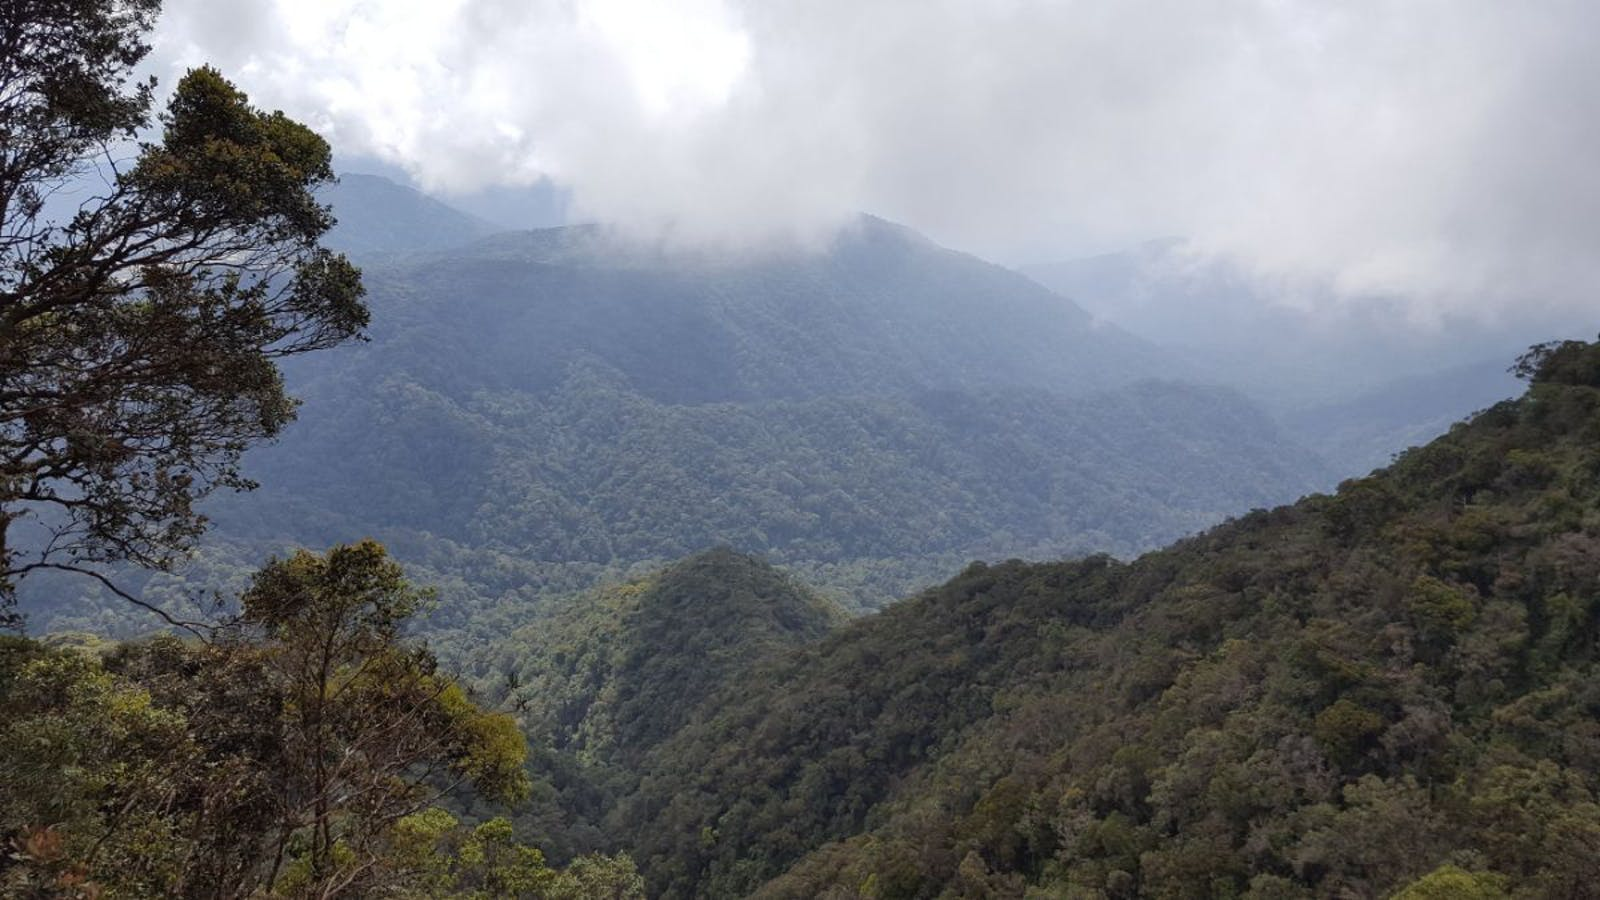 Cameroon Highlands Forests